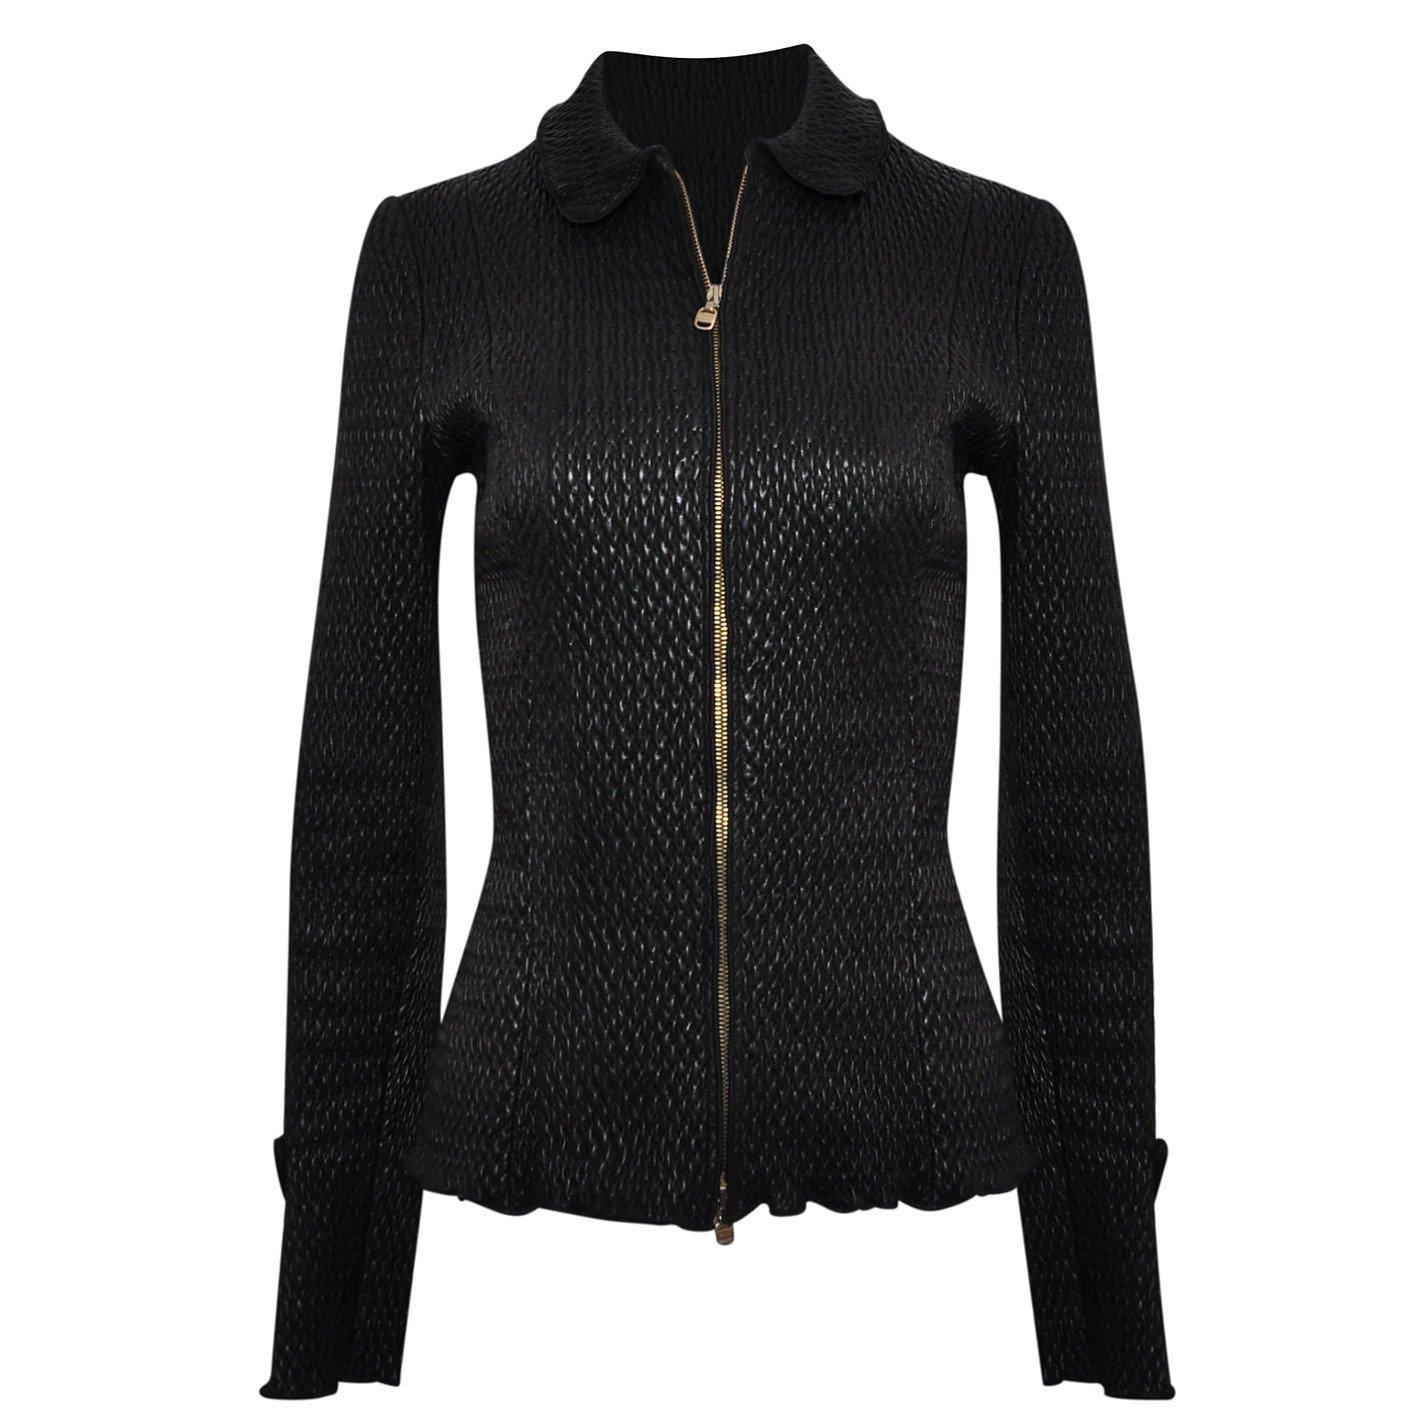 Salvatore Ferragamo Woven Leather Jacket